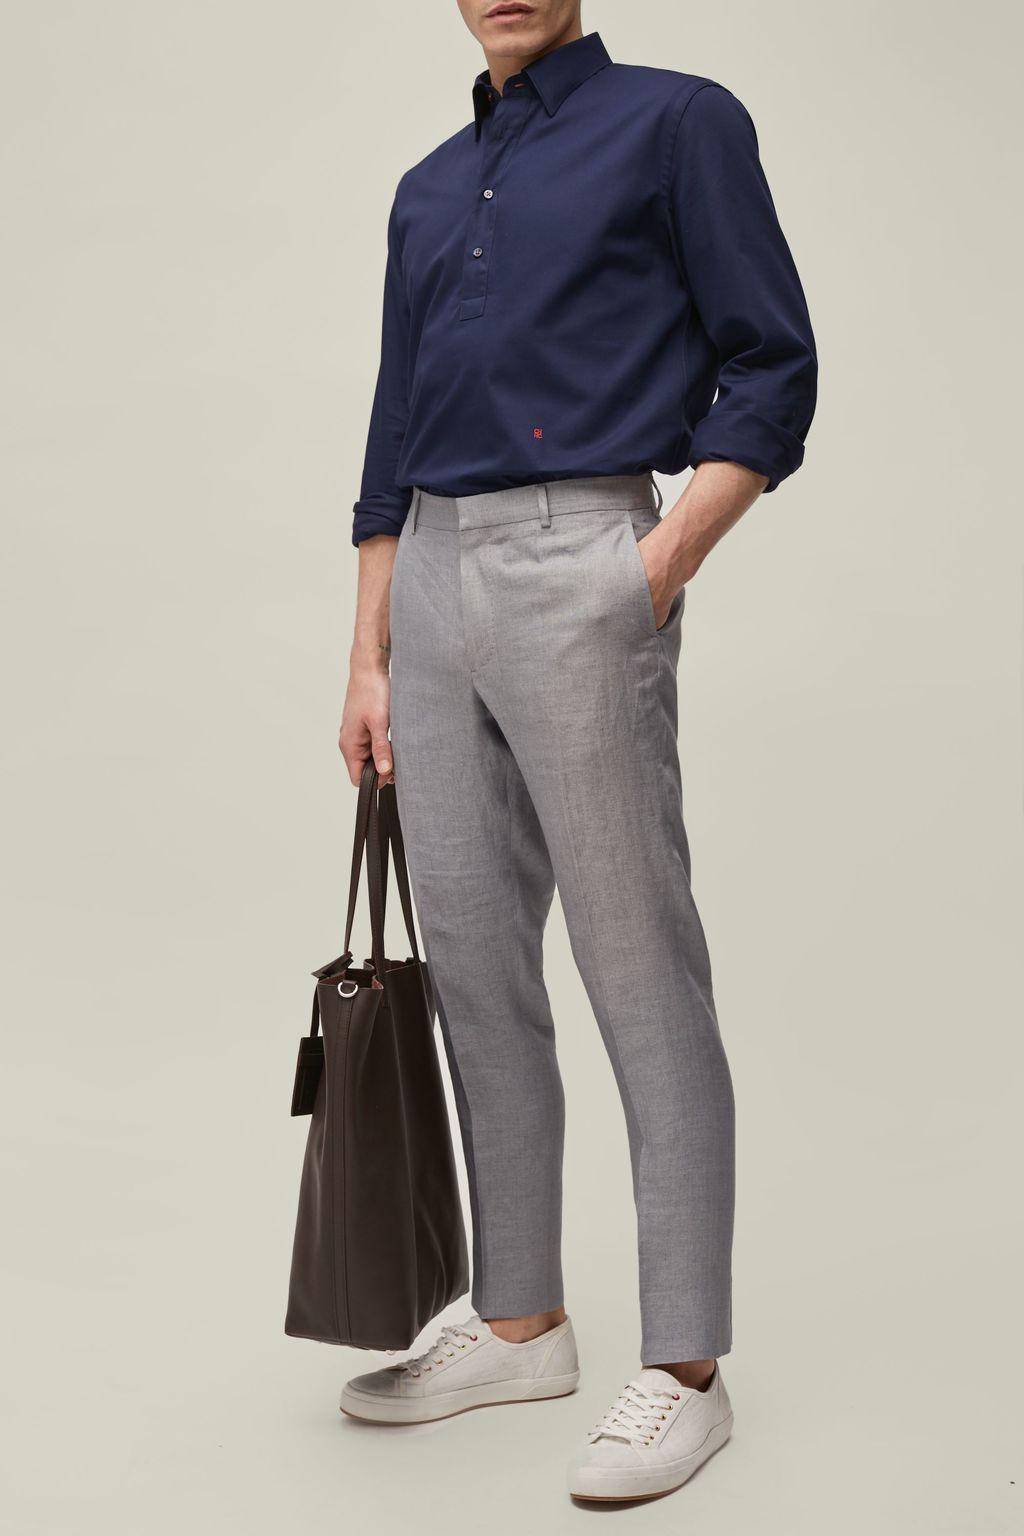 Classic linen pants